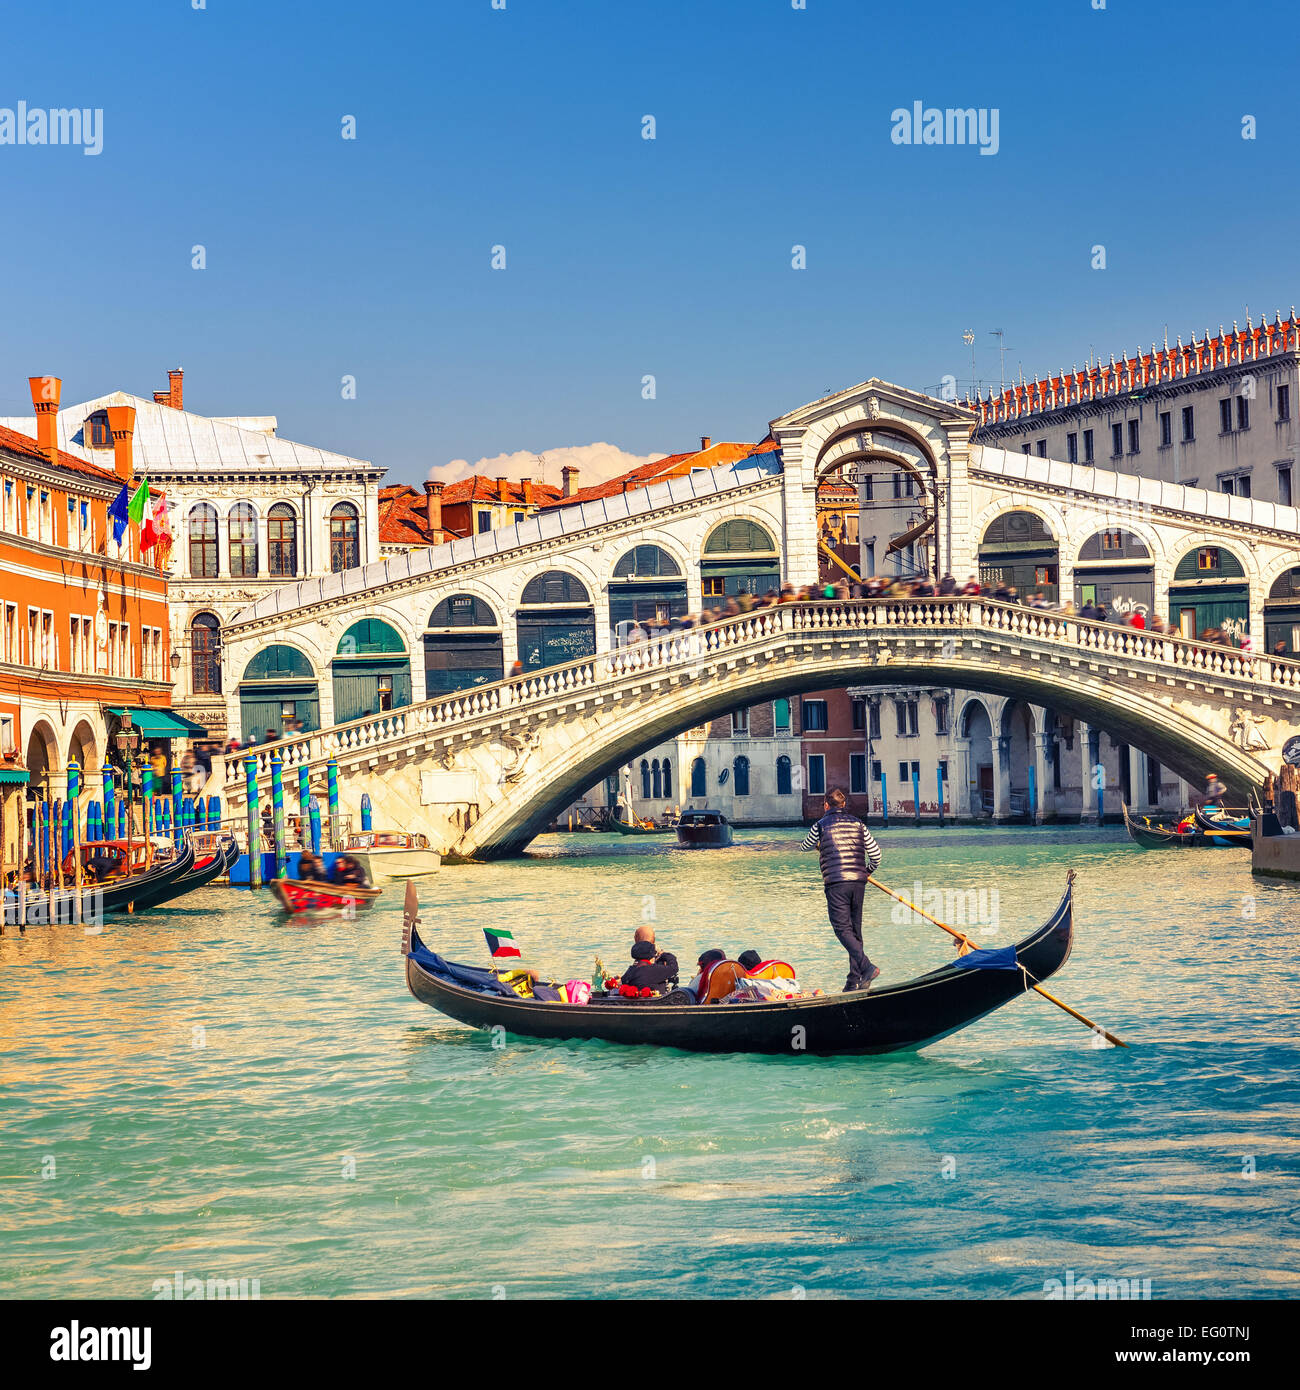 Rialto Bridge in Venice - Stock Image